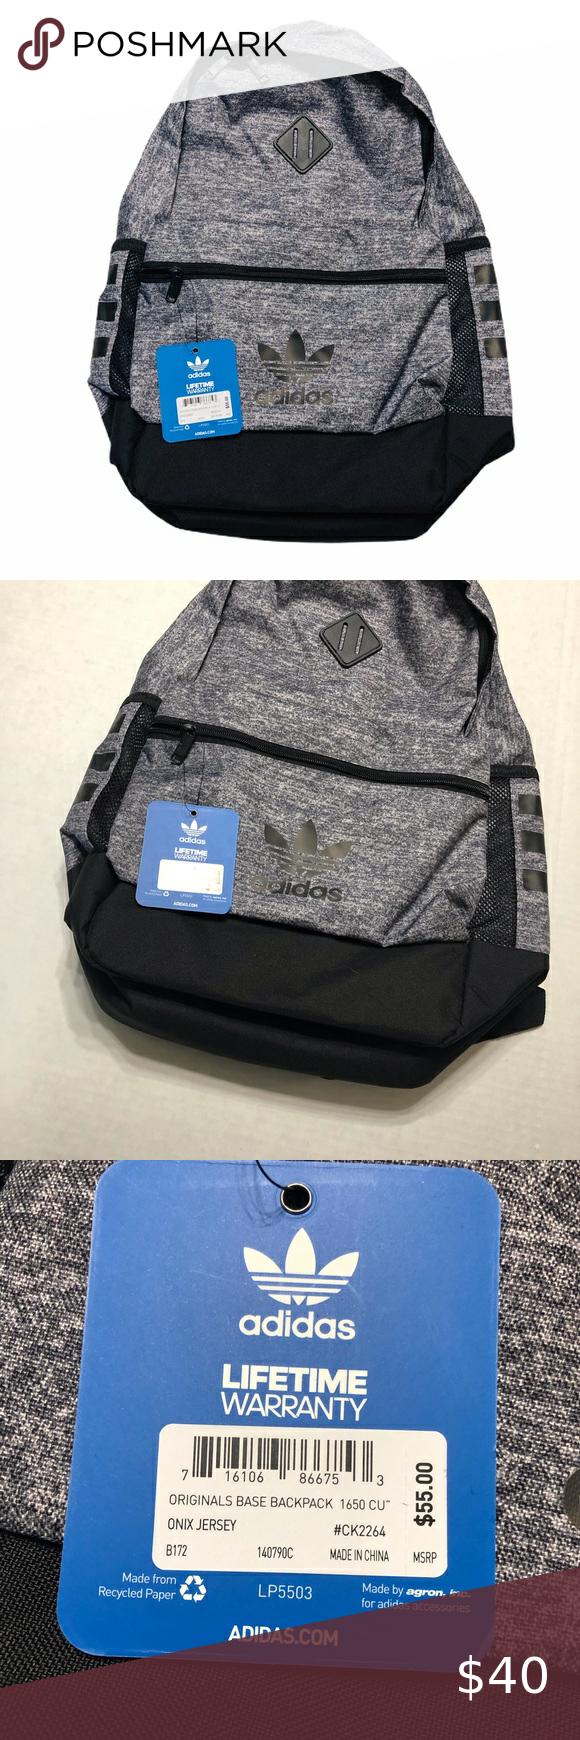 NWT Adidas Originals Base Backpack - Onix Jersey | Black backpack ...